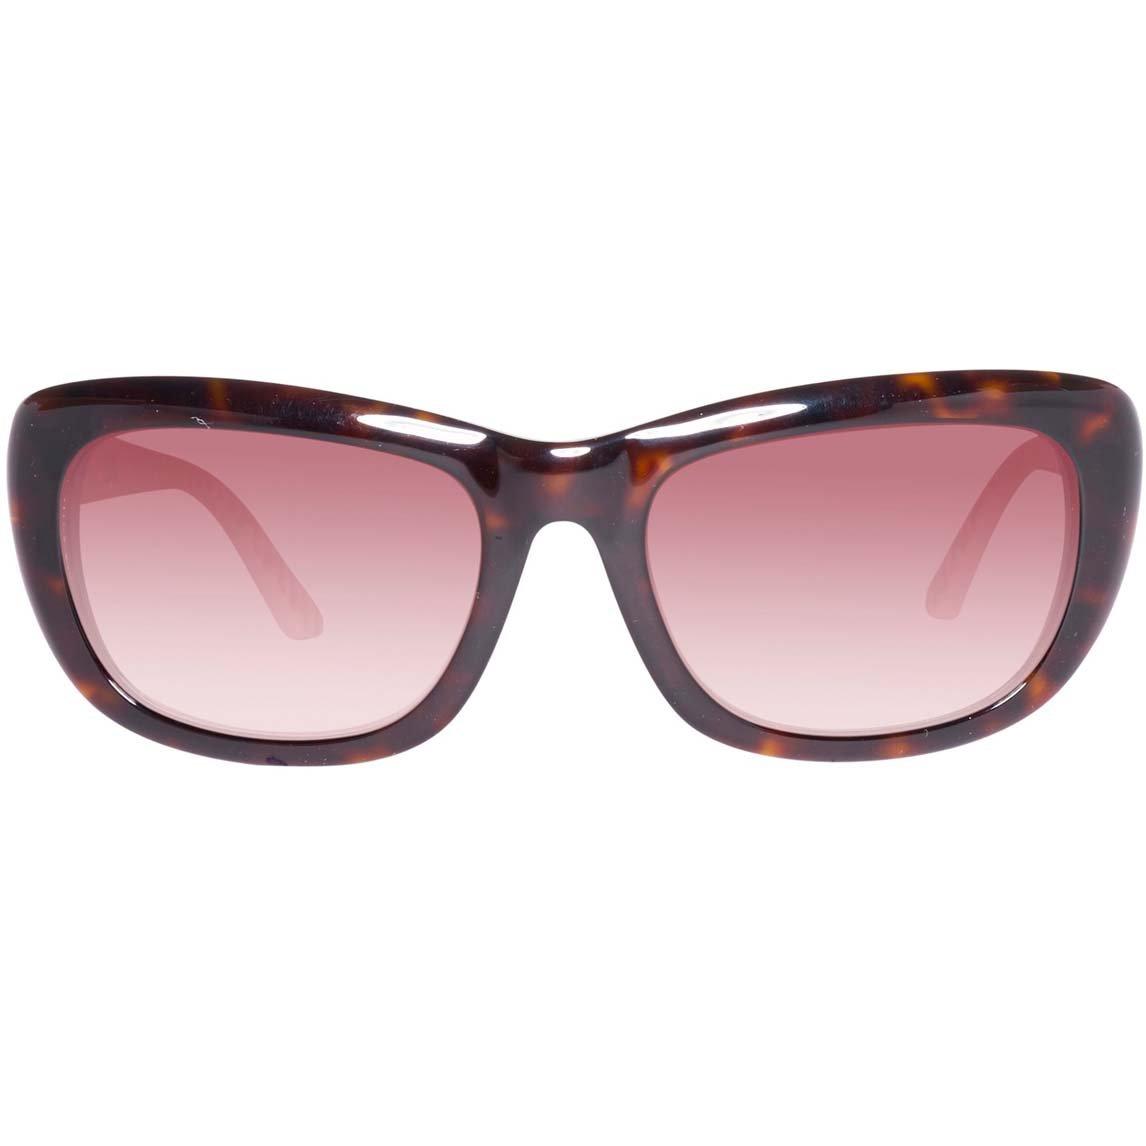 Karl Lagerfeld Gafas de Sol KS 6014/S 078 PVP 200, 00 Euro ...